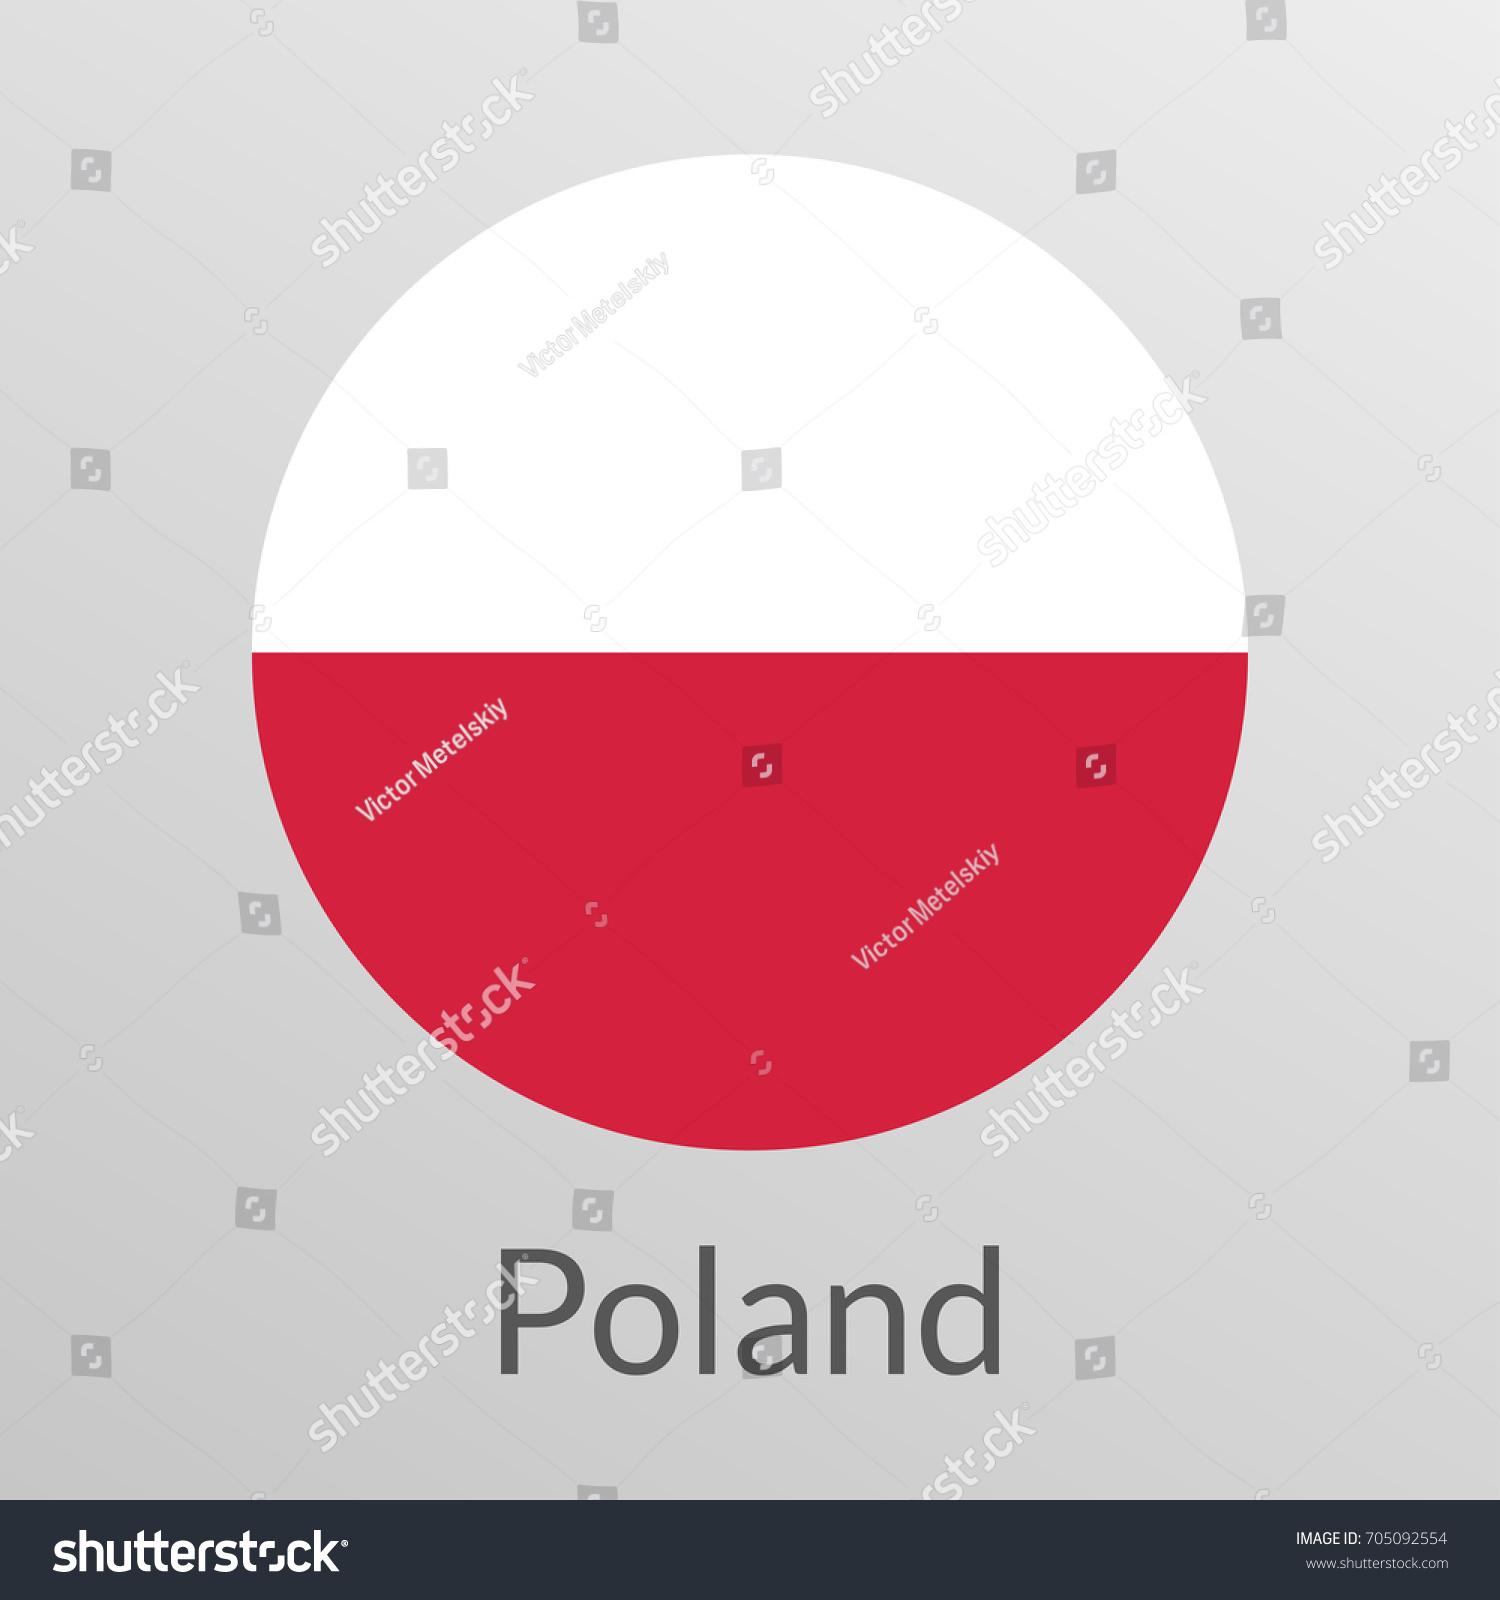 Flag poland round icon badge button stock illustration 705092554 flag of poland round icon badge or button polish national symbol biocorpaavc